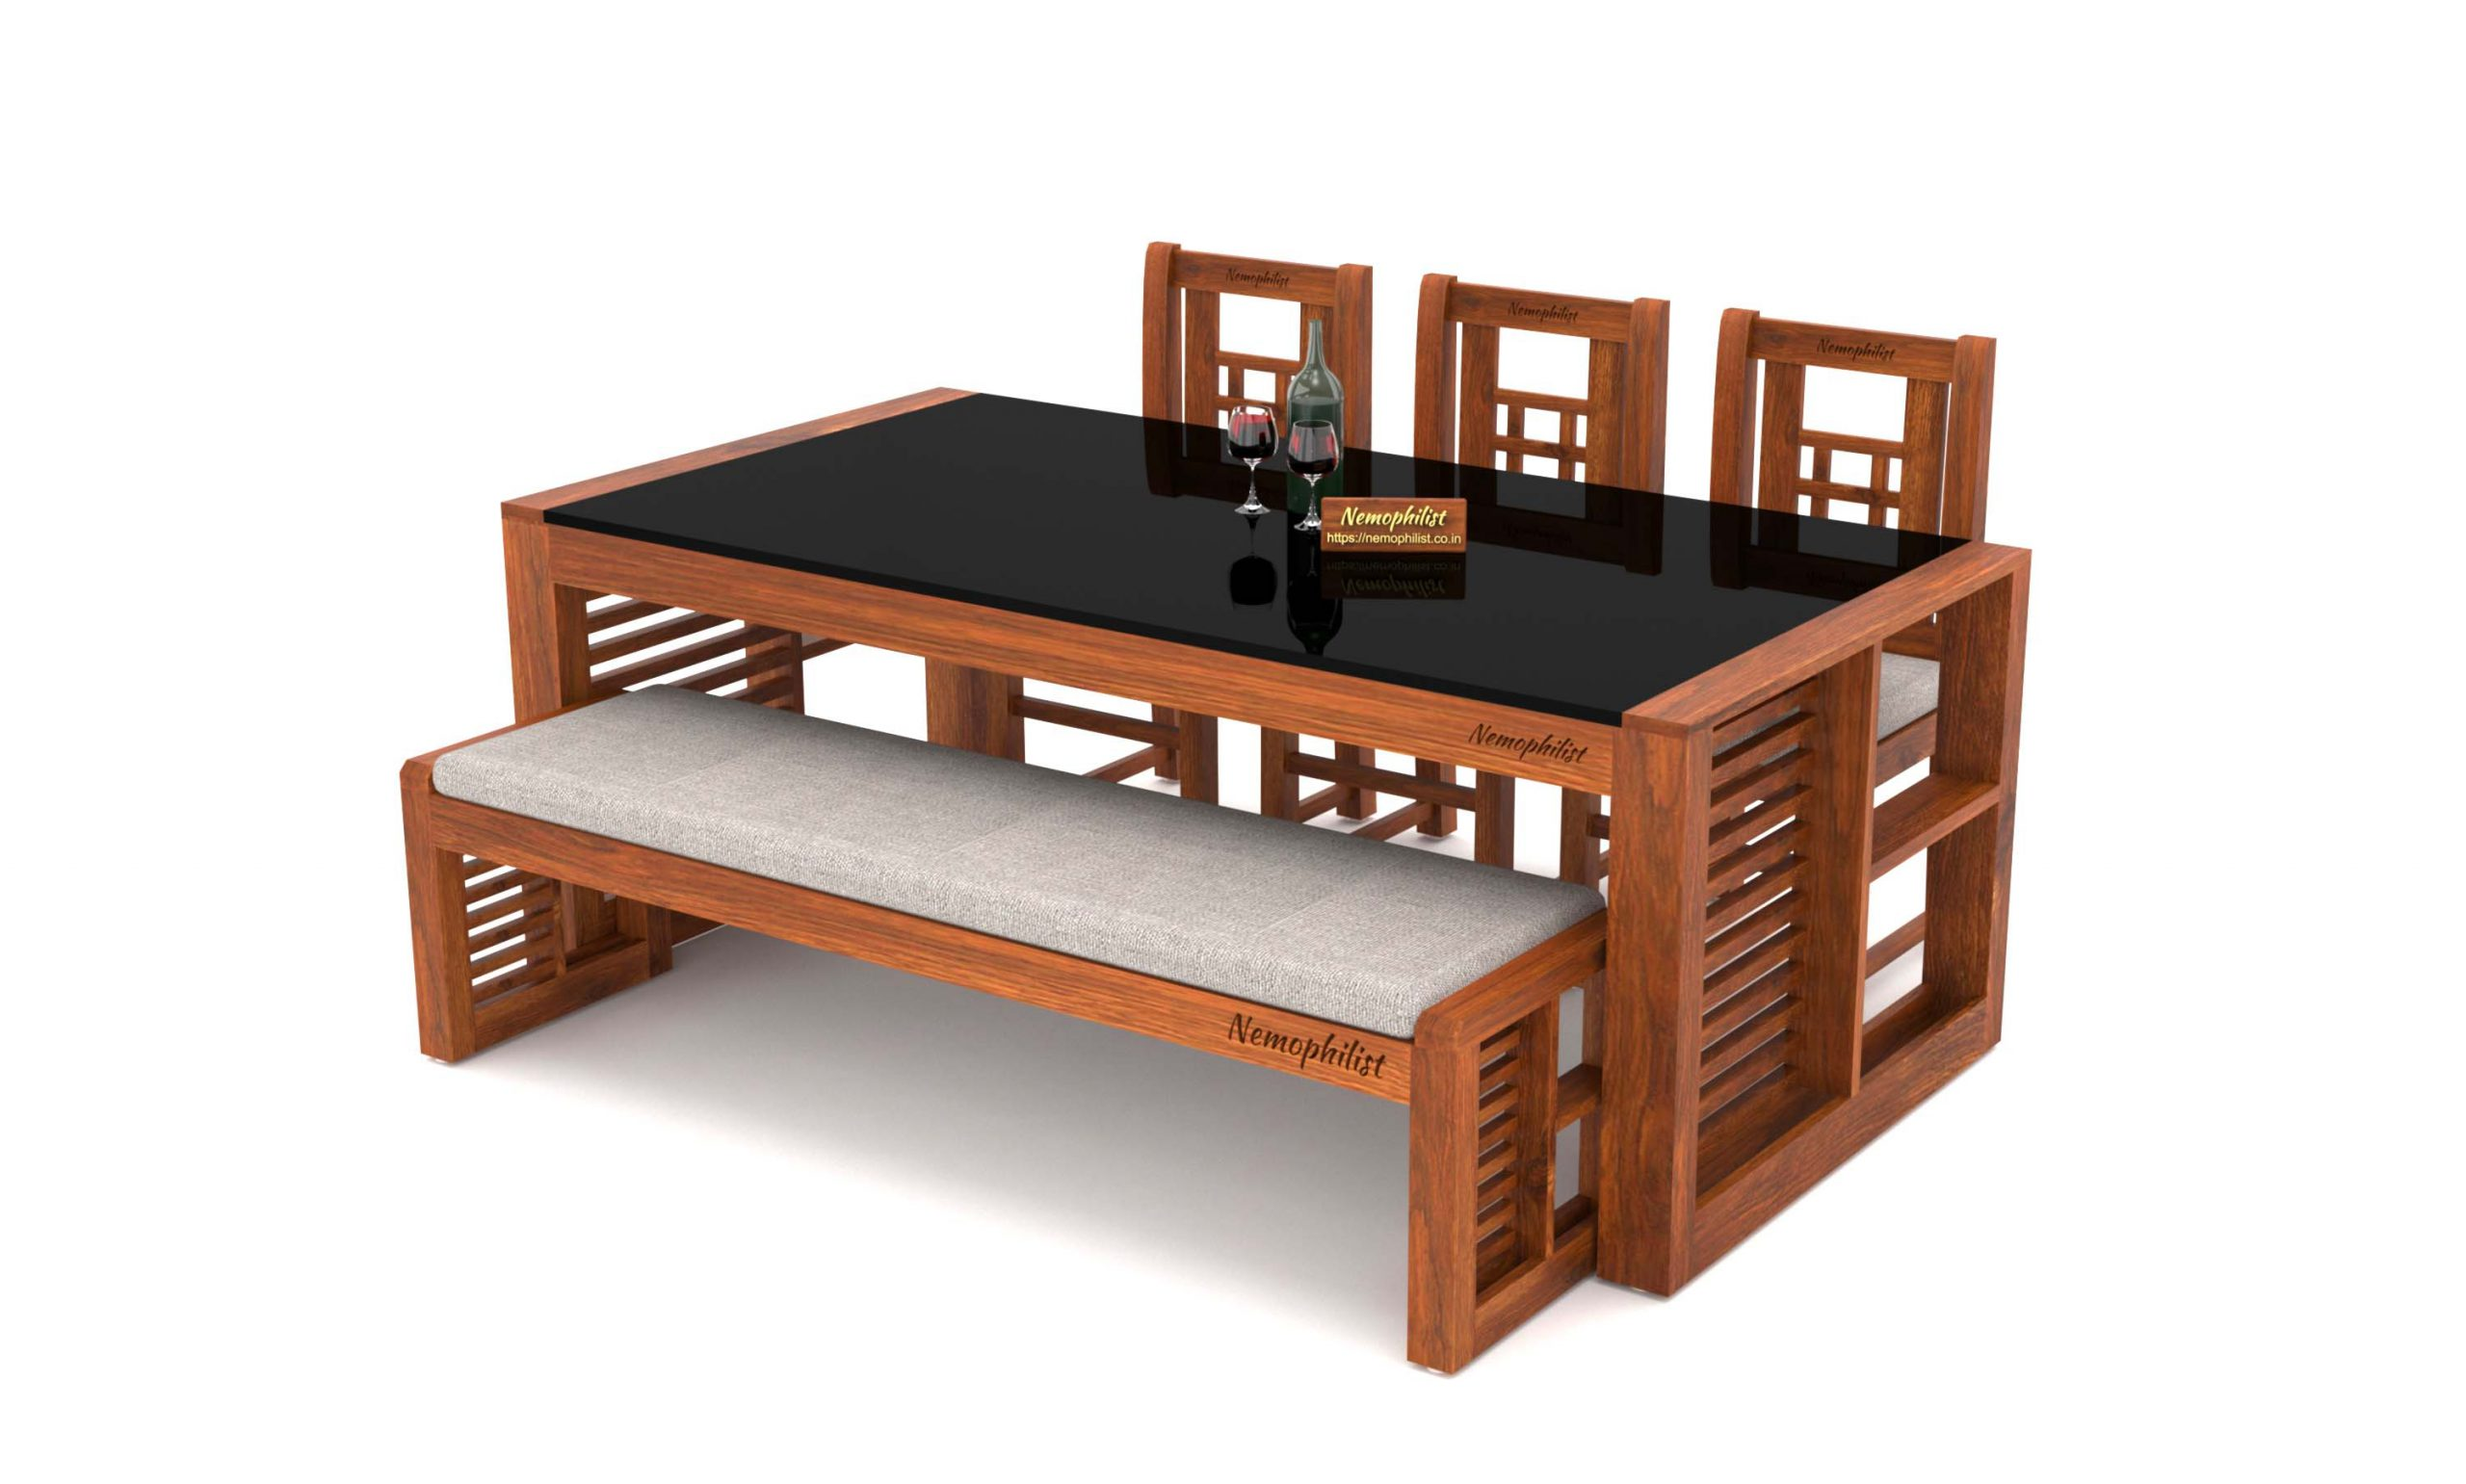 Teak Wood Dining Table Xylophilous, Teak Wood Dining Room Table